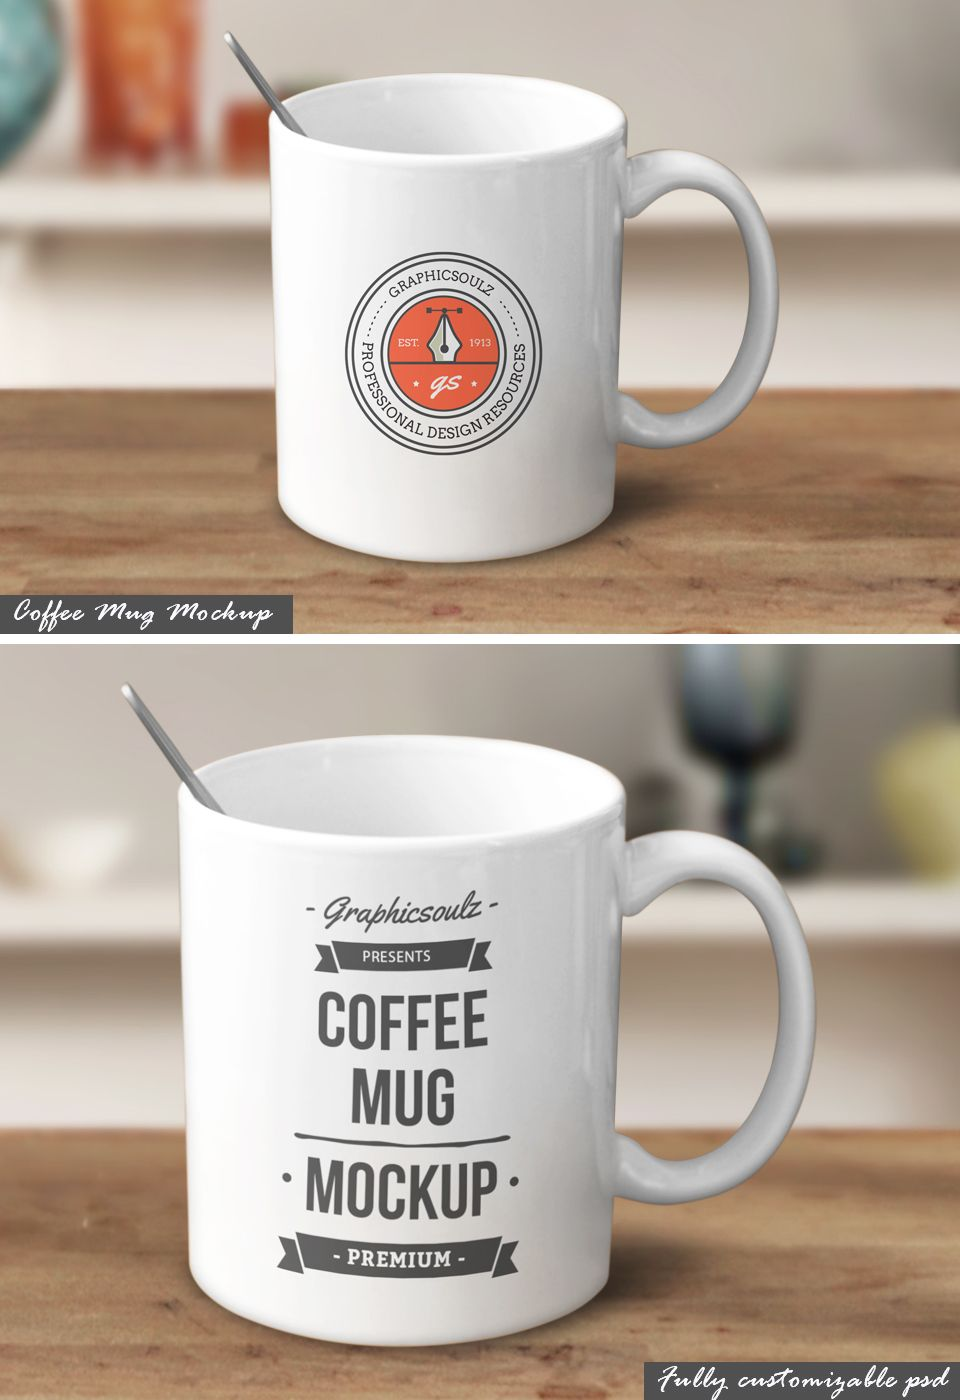 Coffee Mug Mockup Mugs, Coffee mugs, Coffee